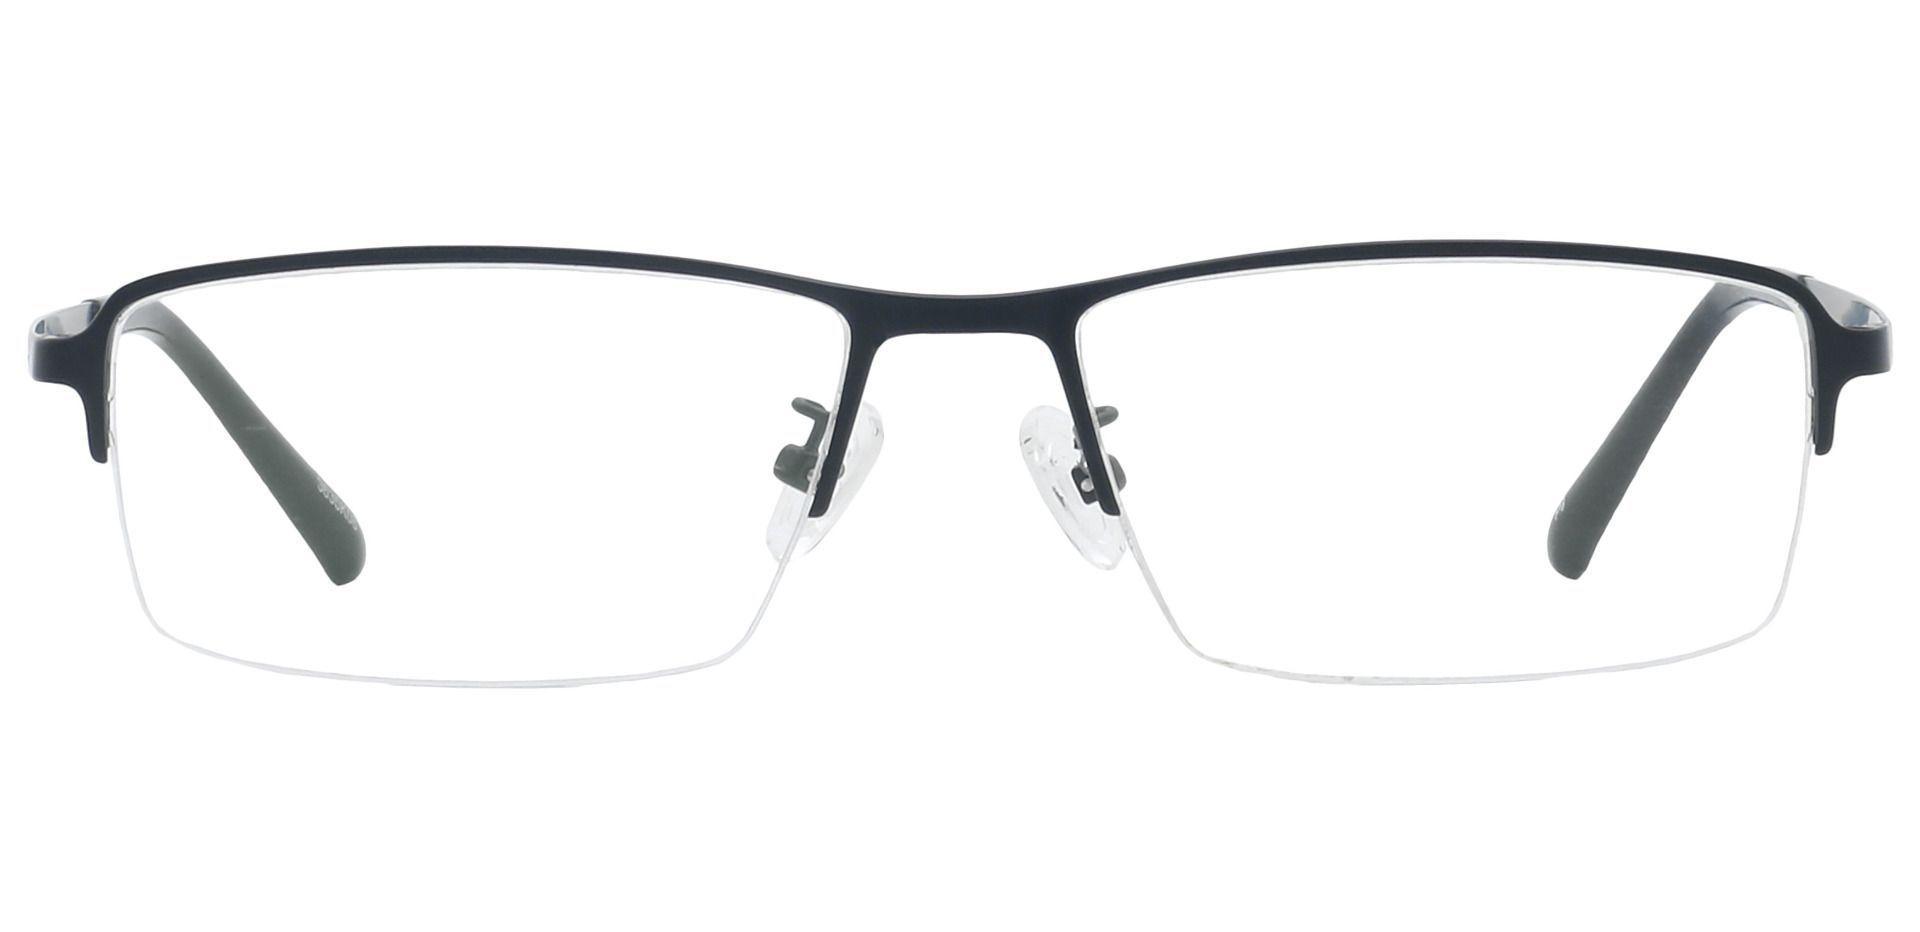 Channing Rectangle Progressive Glasses - Black